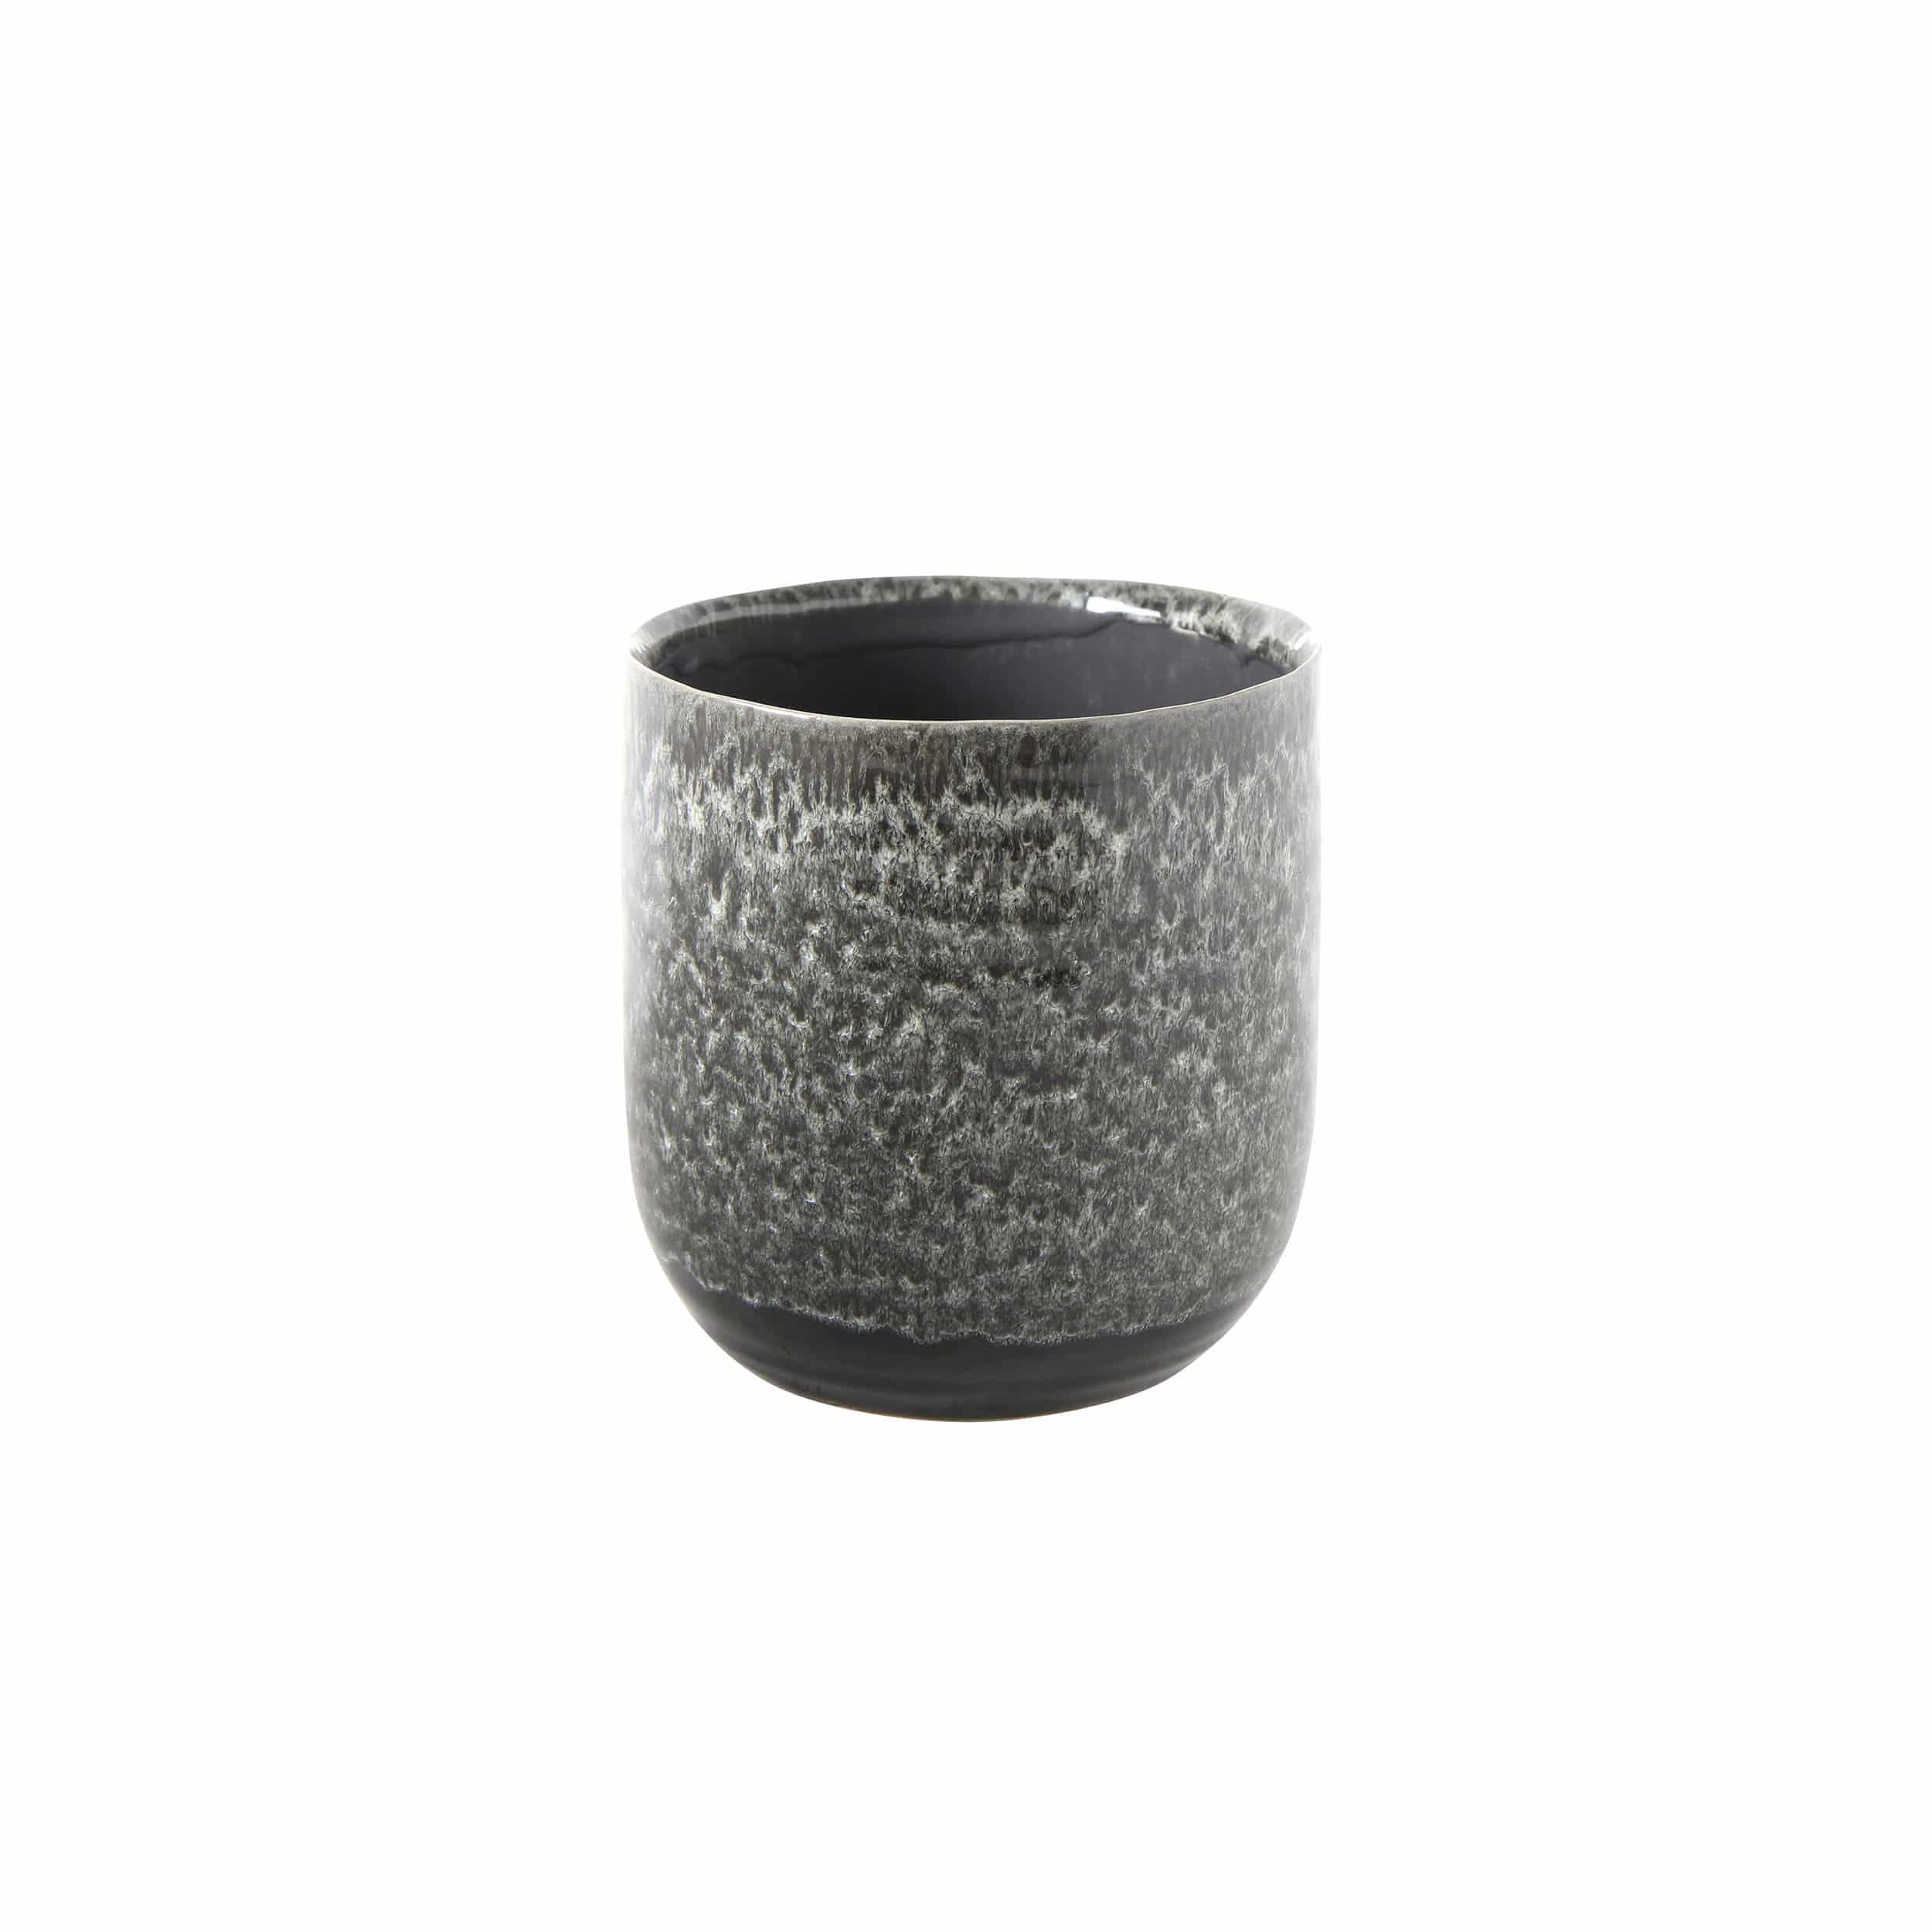 Blumentopf Daan D16 cm schwarz